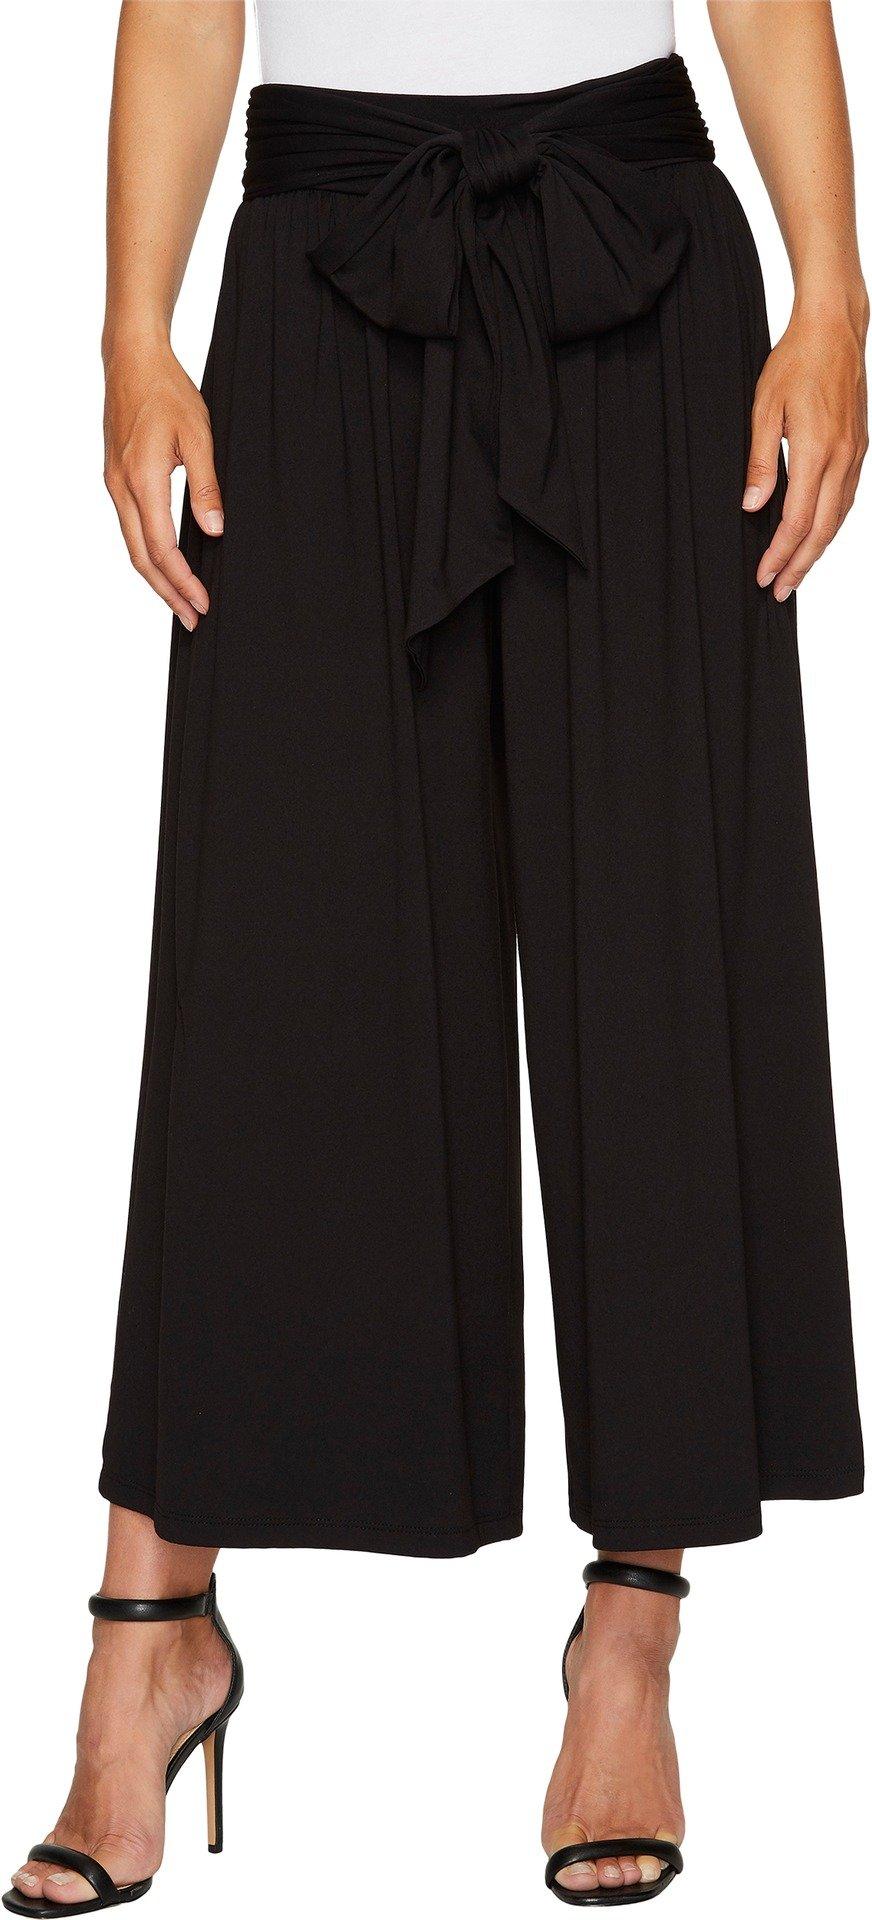 Susana Monaco Women's Leora Pant, Black, XS